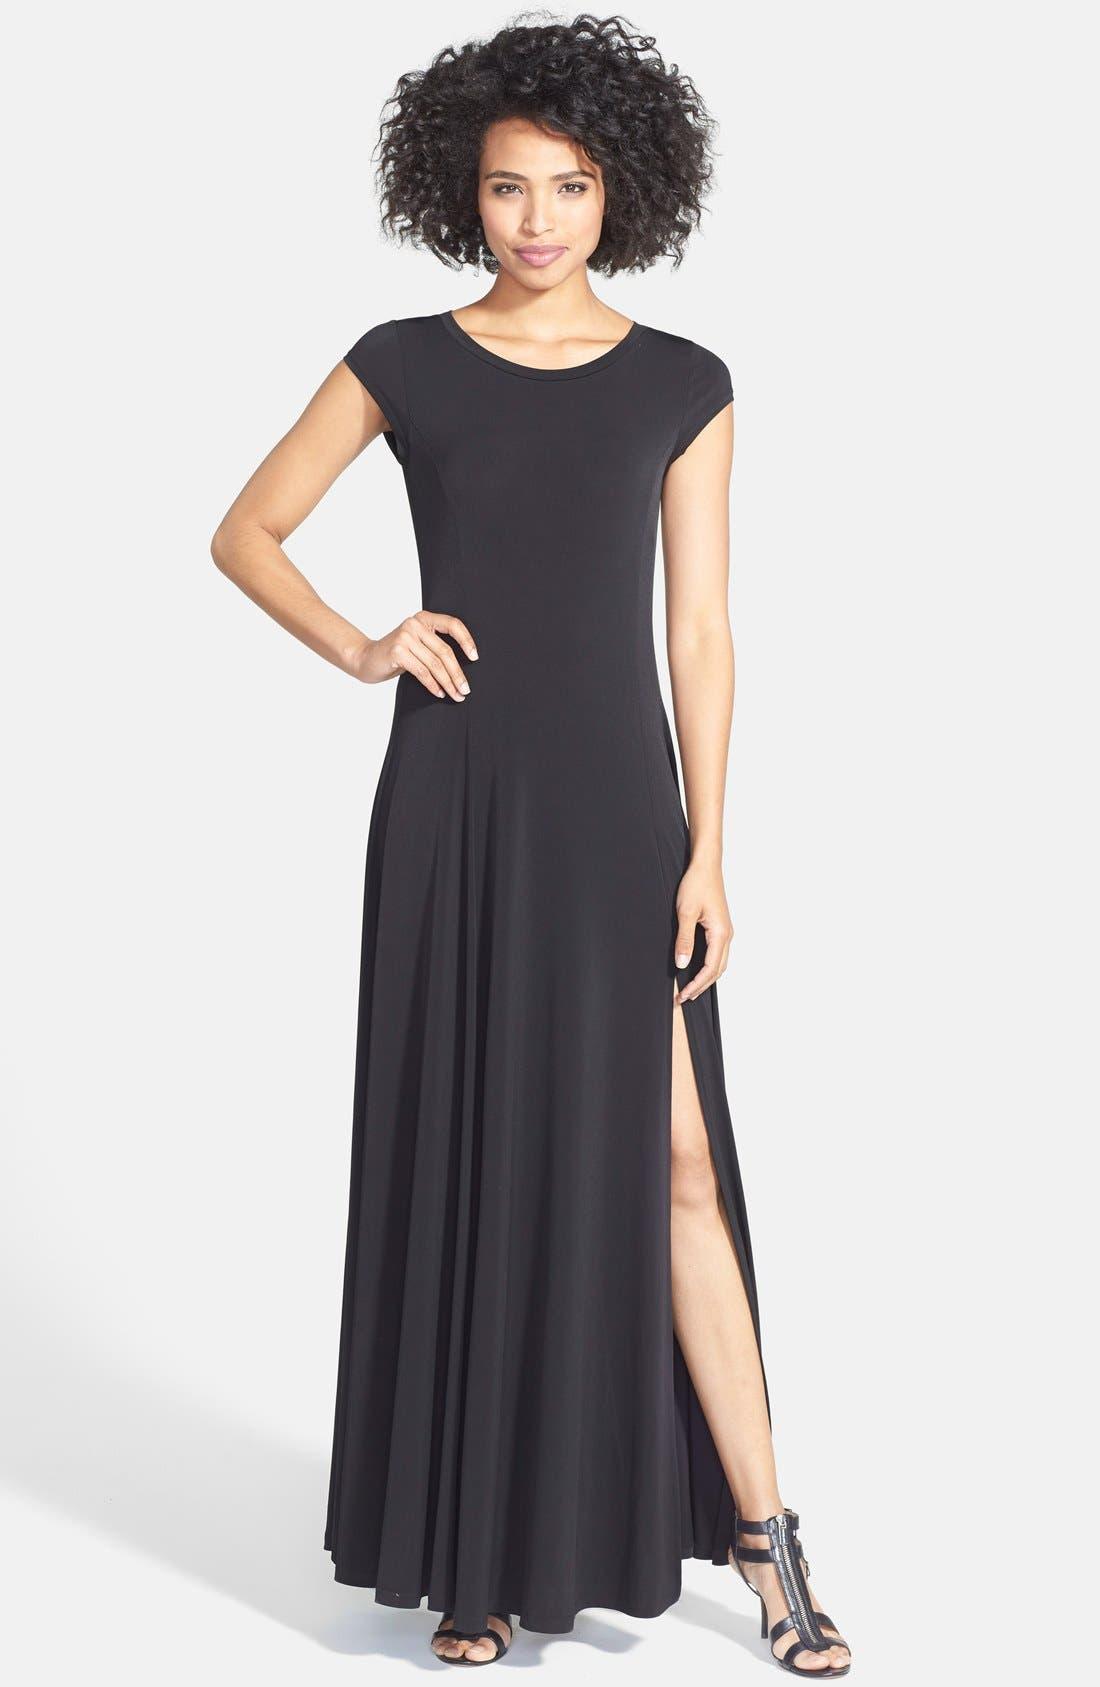 Alternate Image 1 Selected - MICHAEL Michael Kors Cap Sleeve Stretch Jersey Maxi Dress